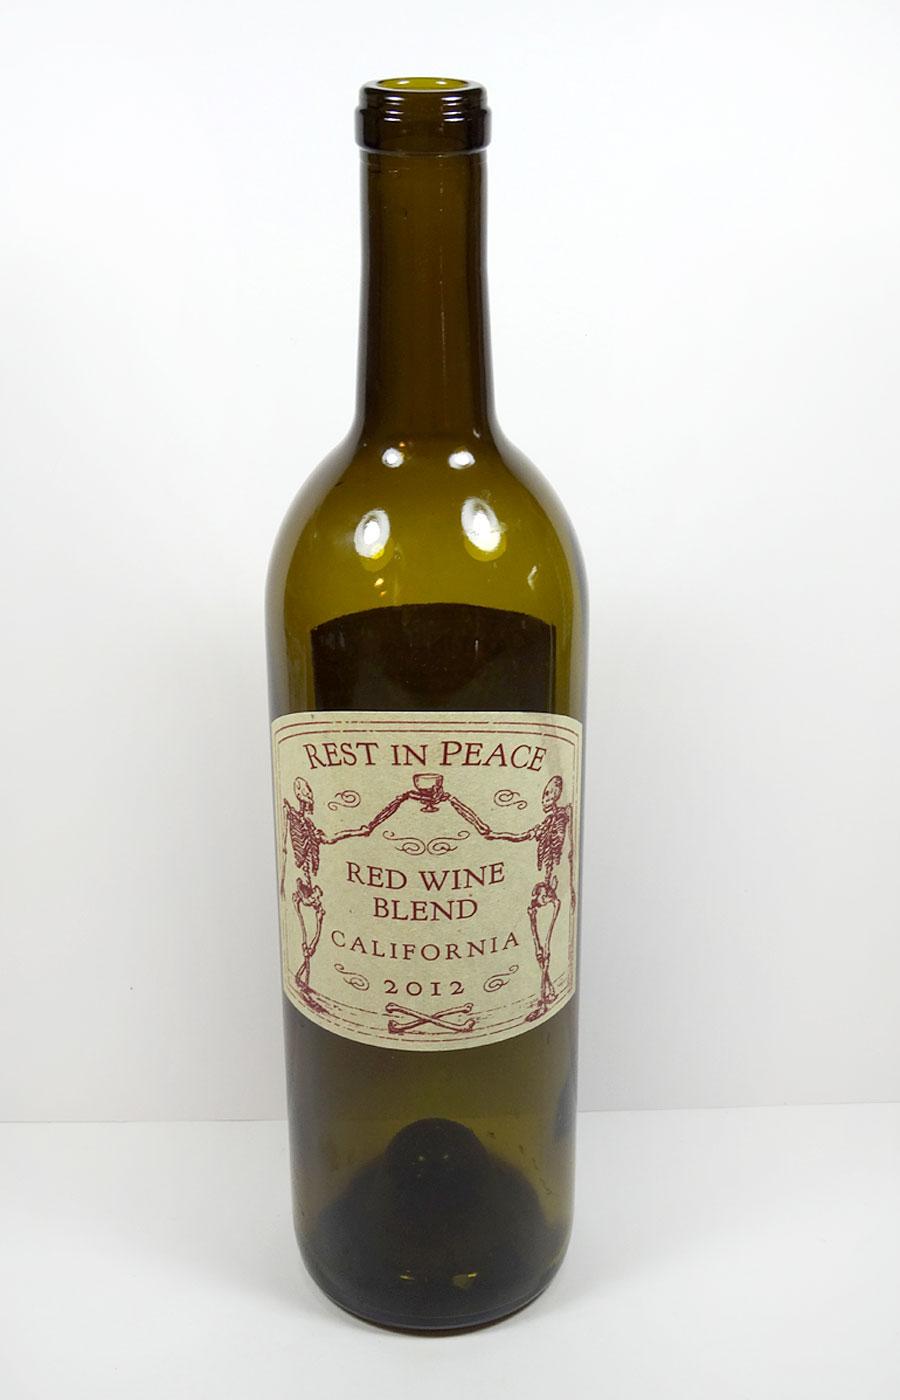 hallloween-altered-wine-by-bottle-annette-green-02